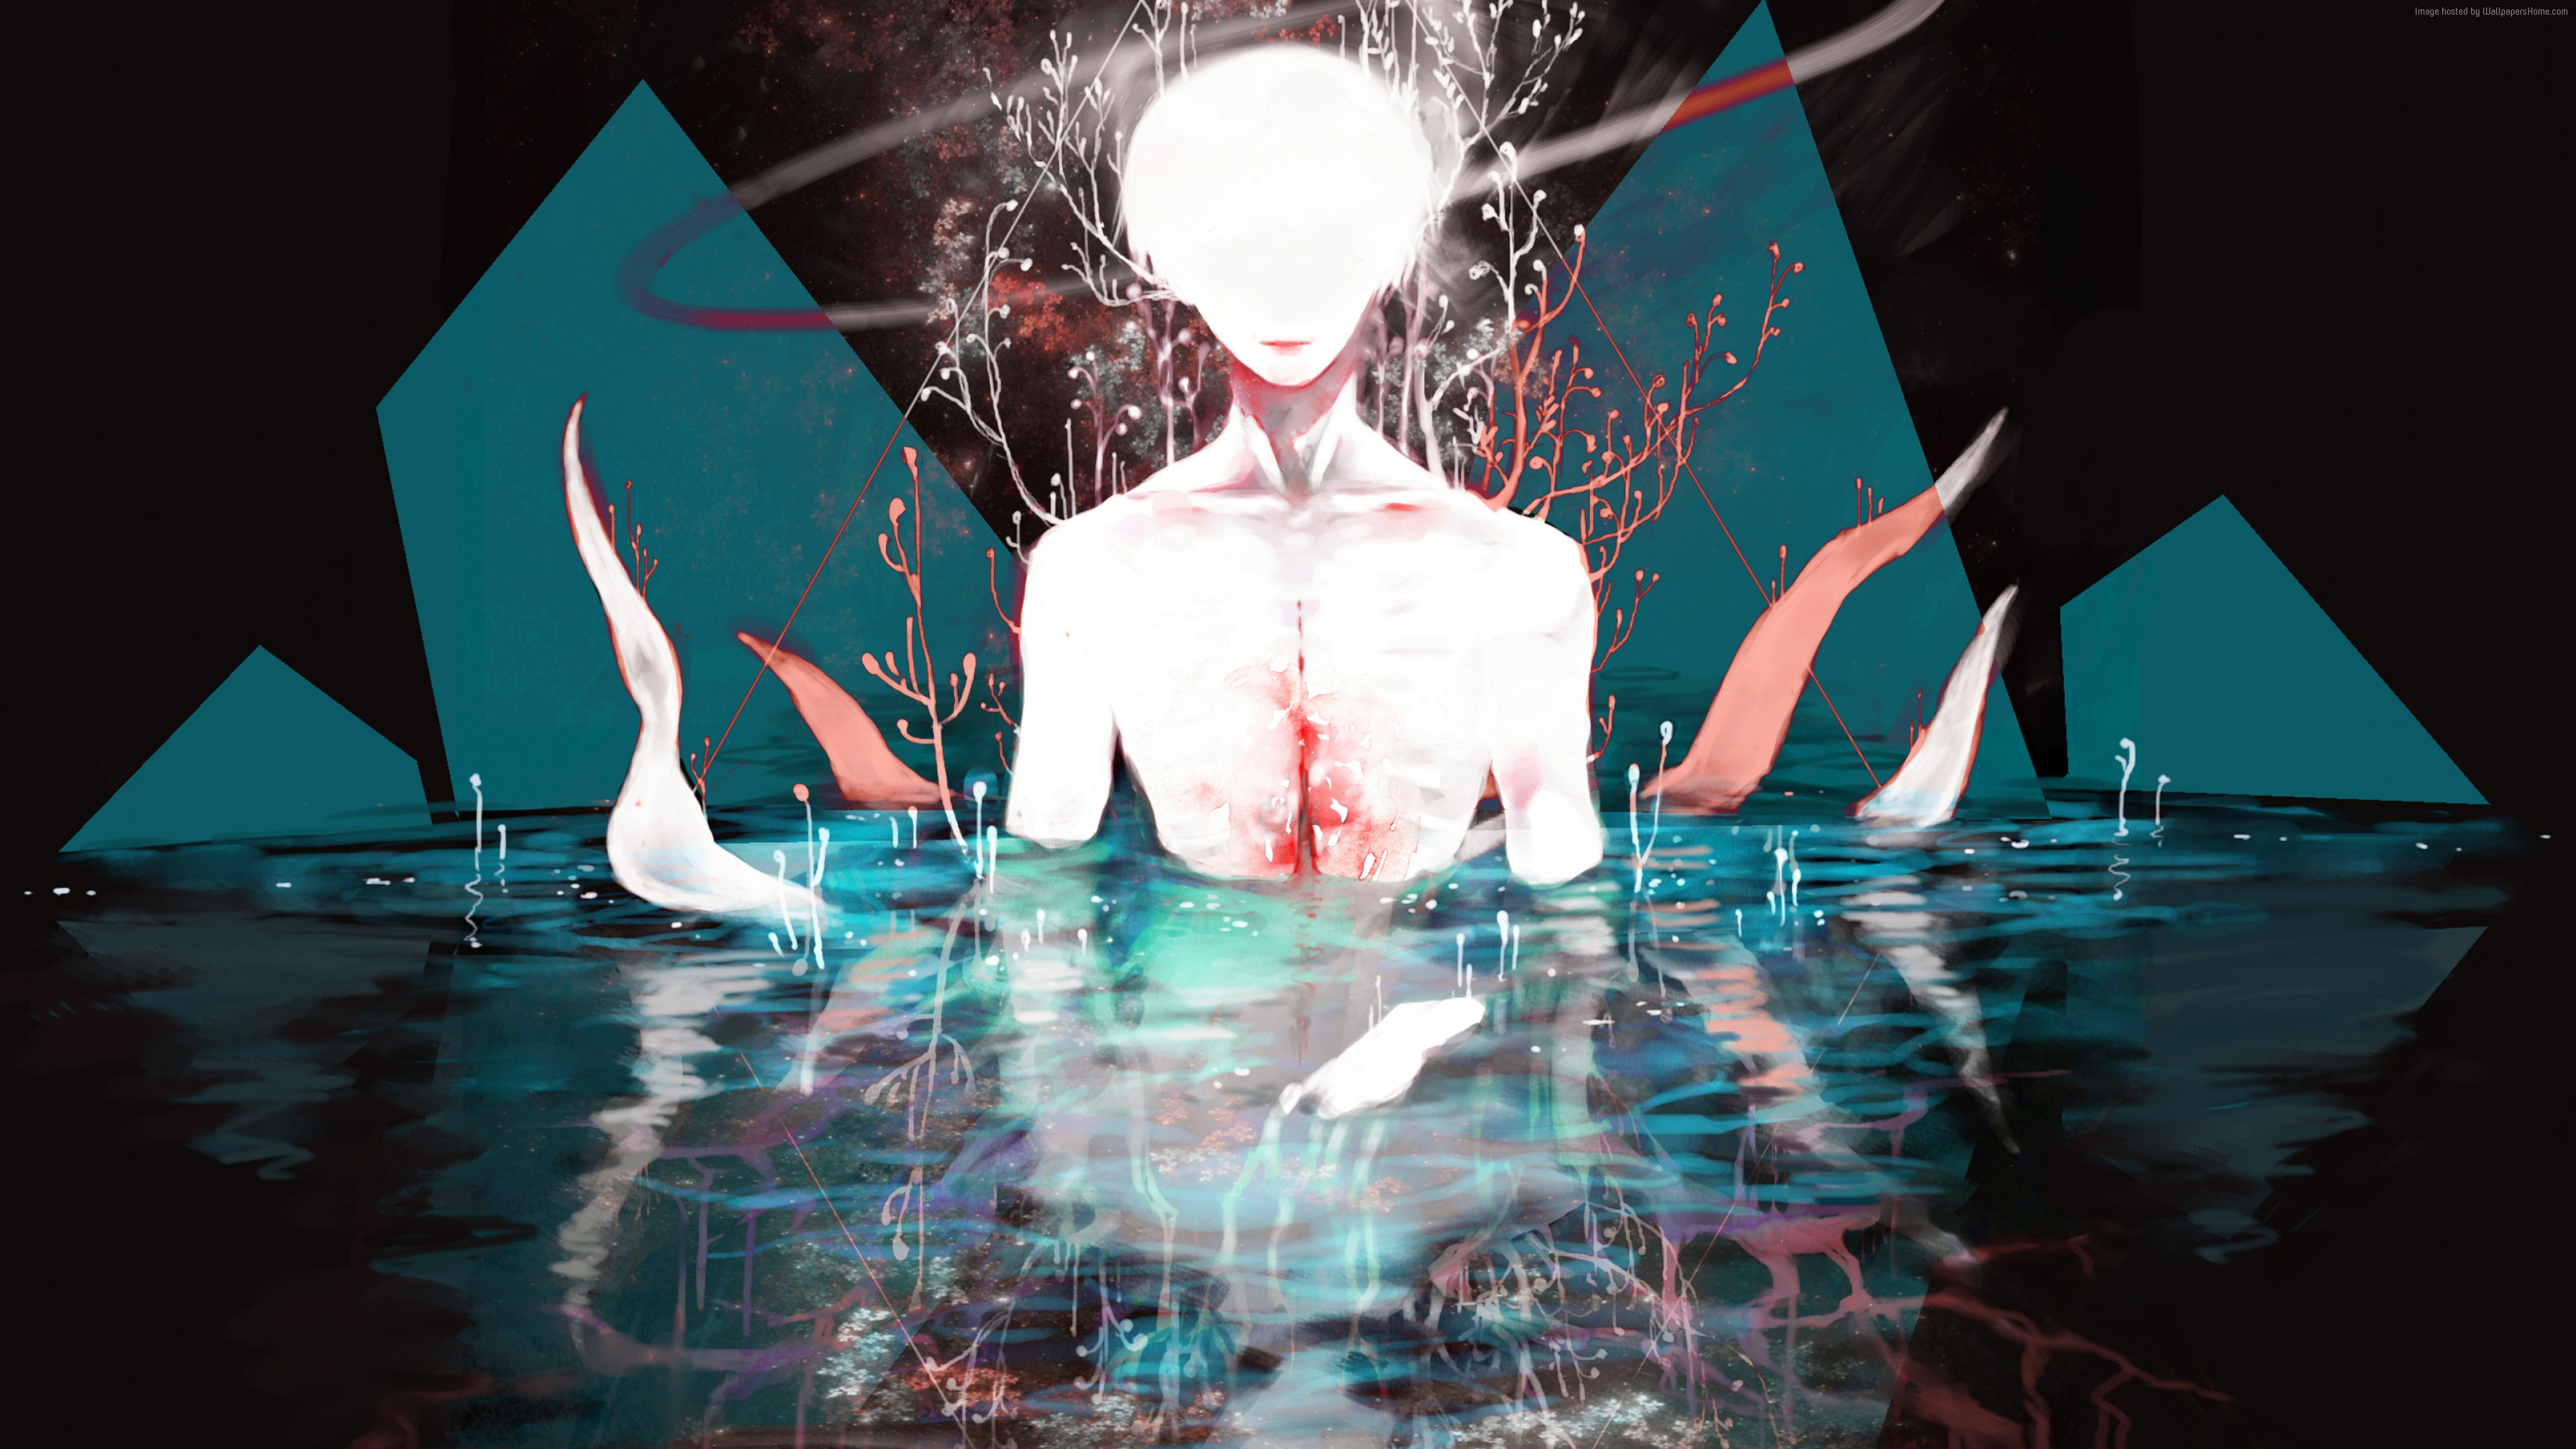 Wallpaper Tokyo Ghoul Ken Kaneki 4k Art Wallpaper Download High Resolution 4k Wallpaper